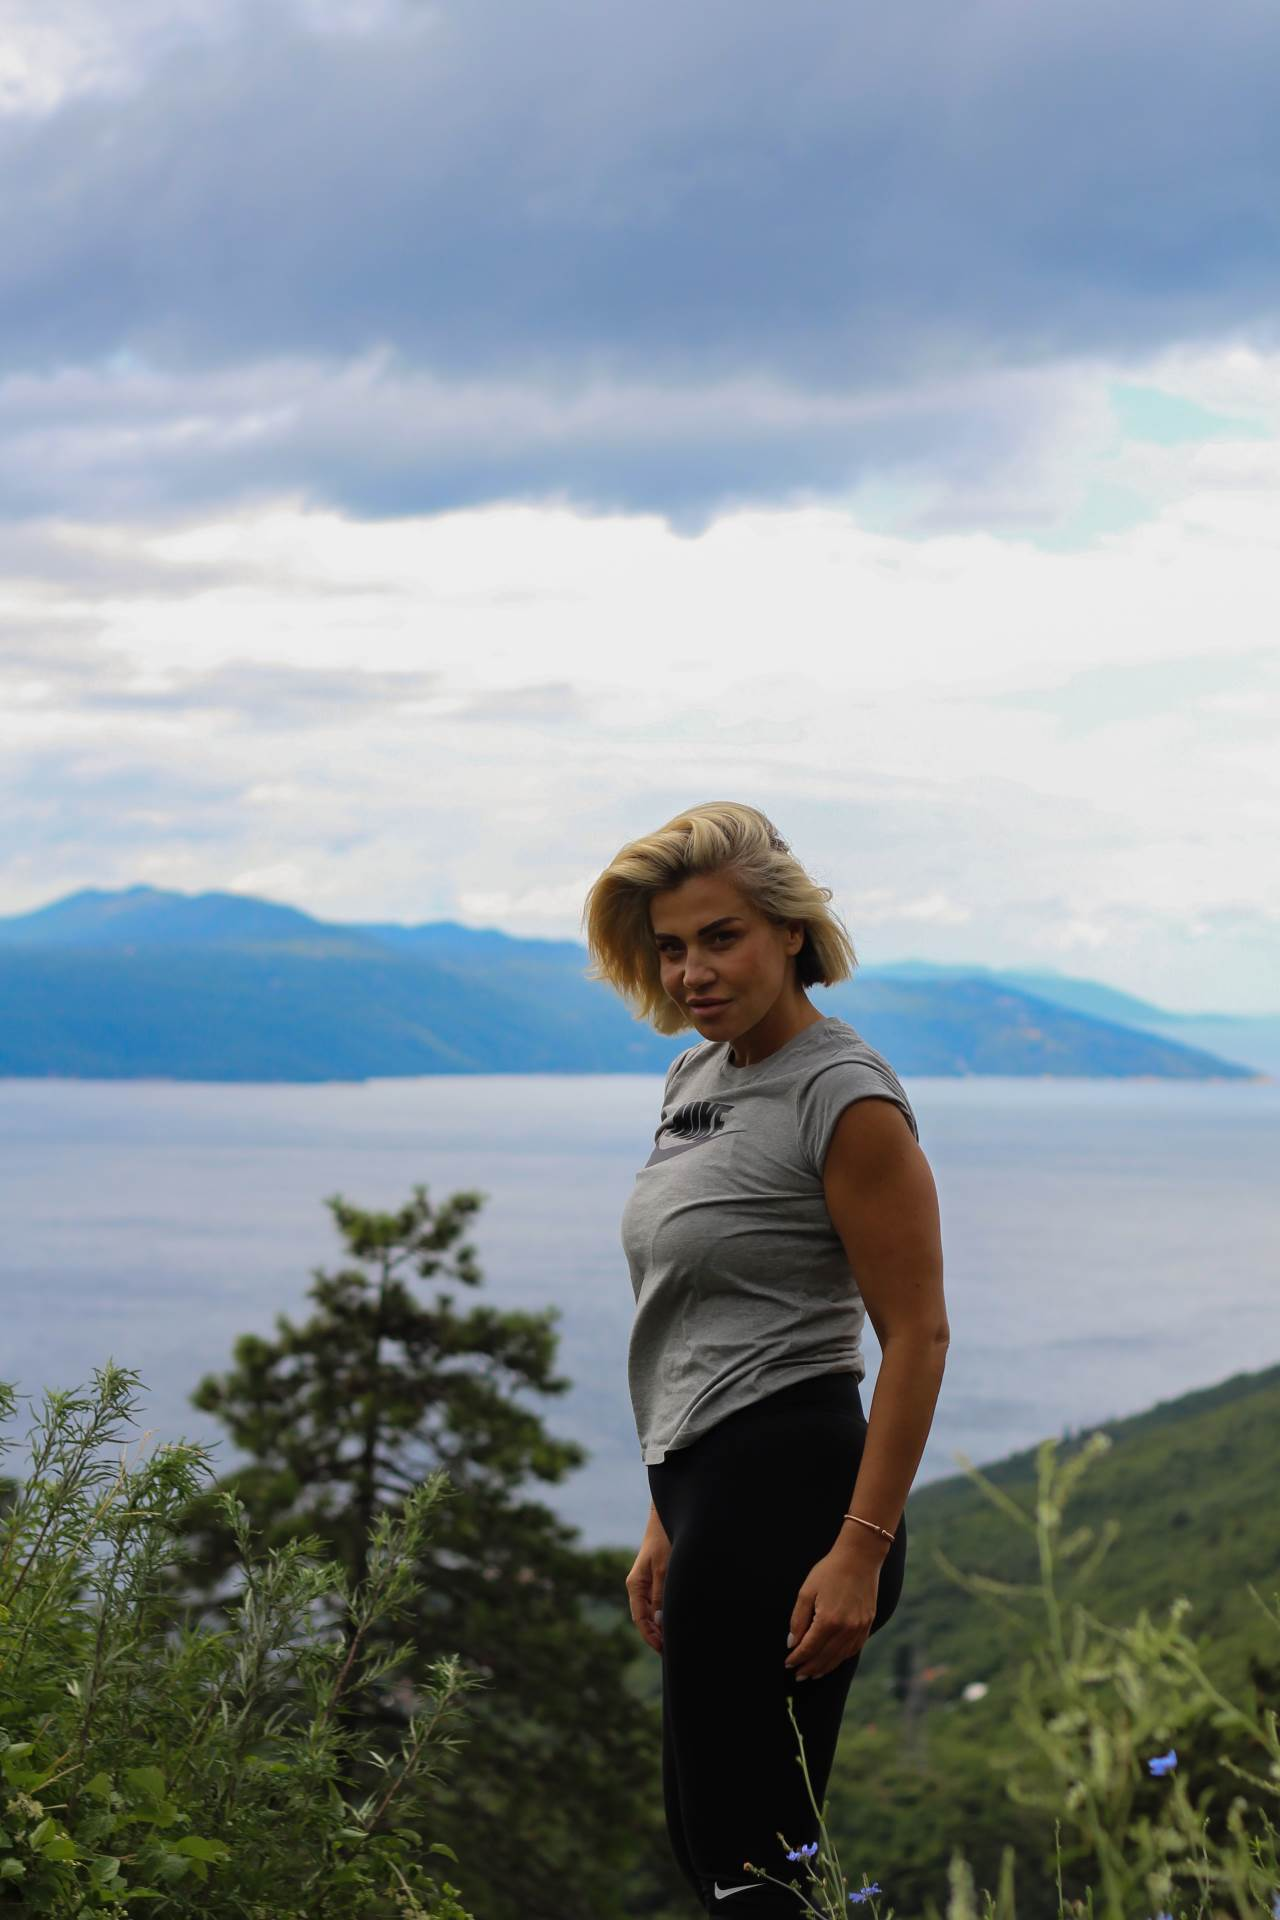 Suzana Štimac